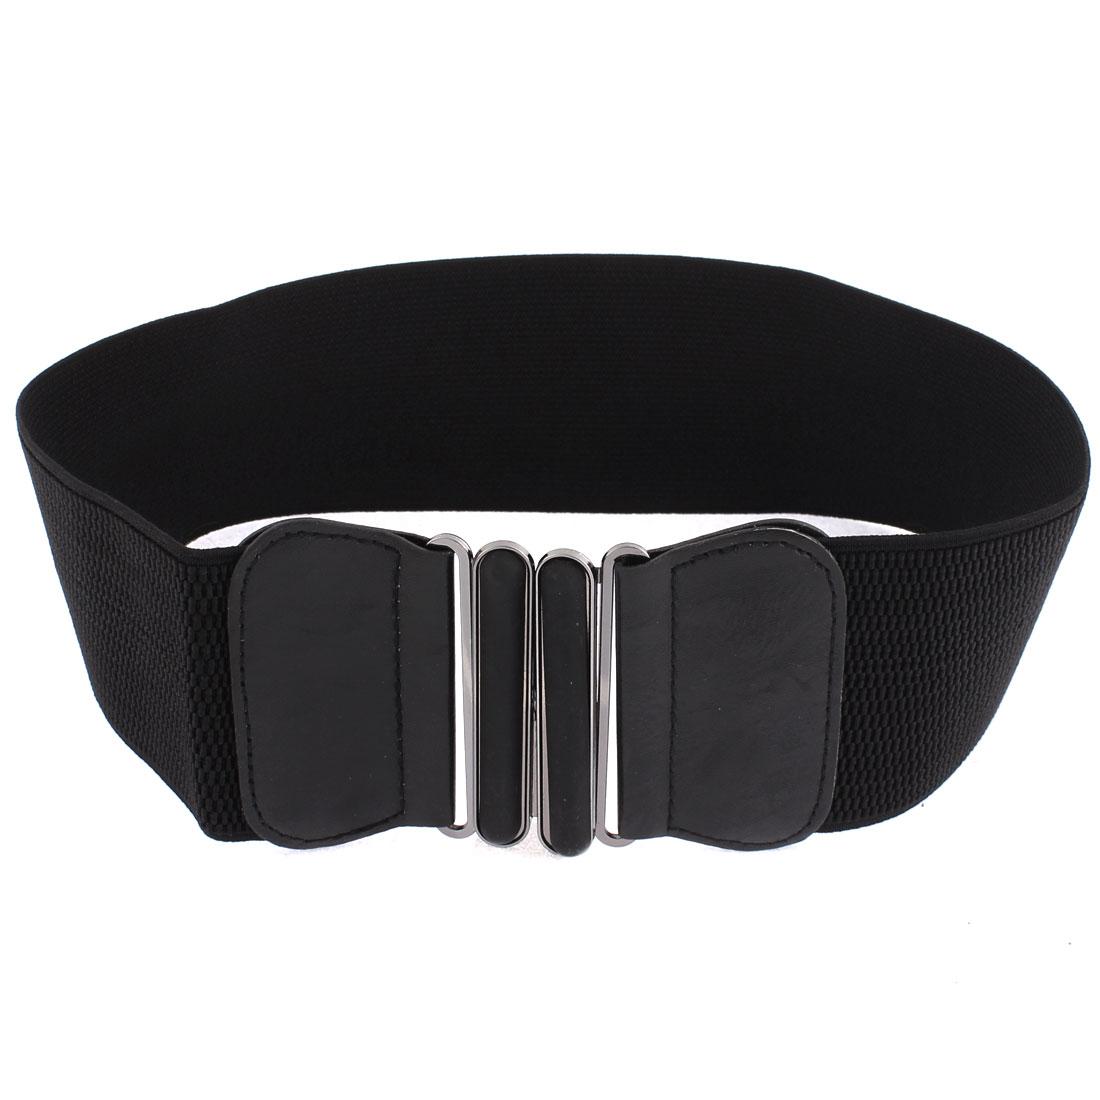 Adjustable Elastic Wide Waistband Waist Belt 61cm Long Black for Lady